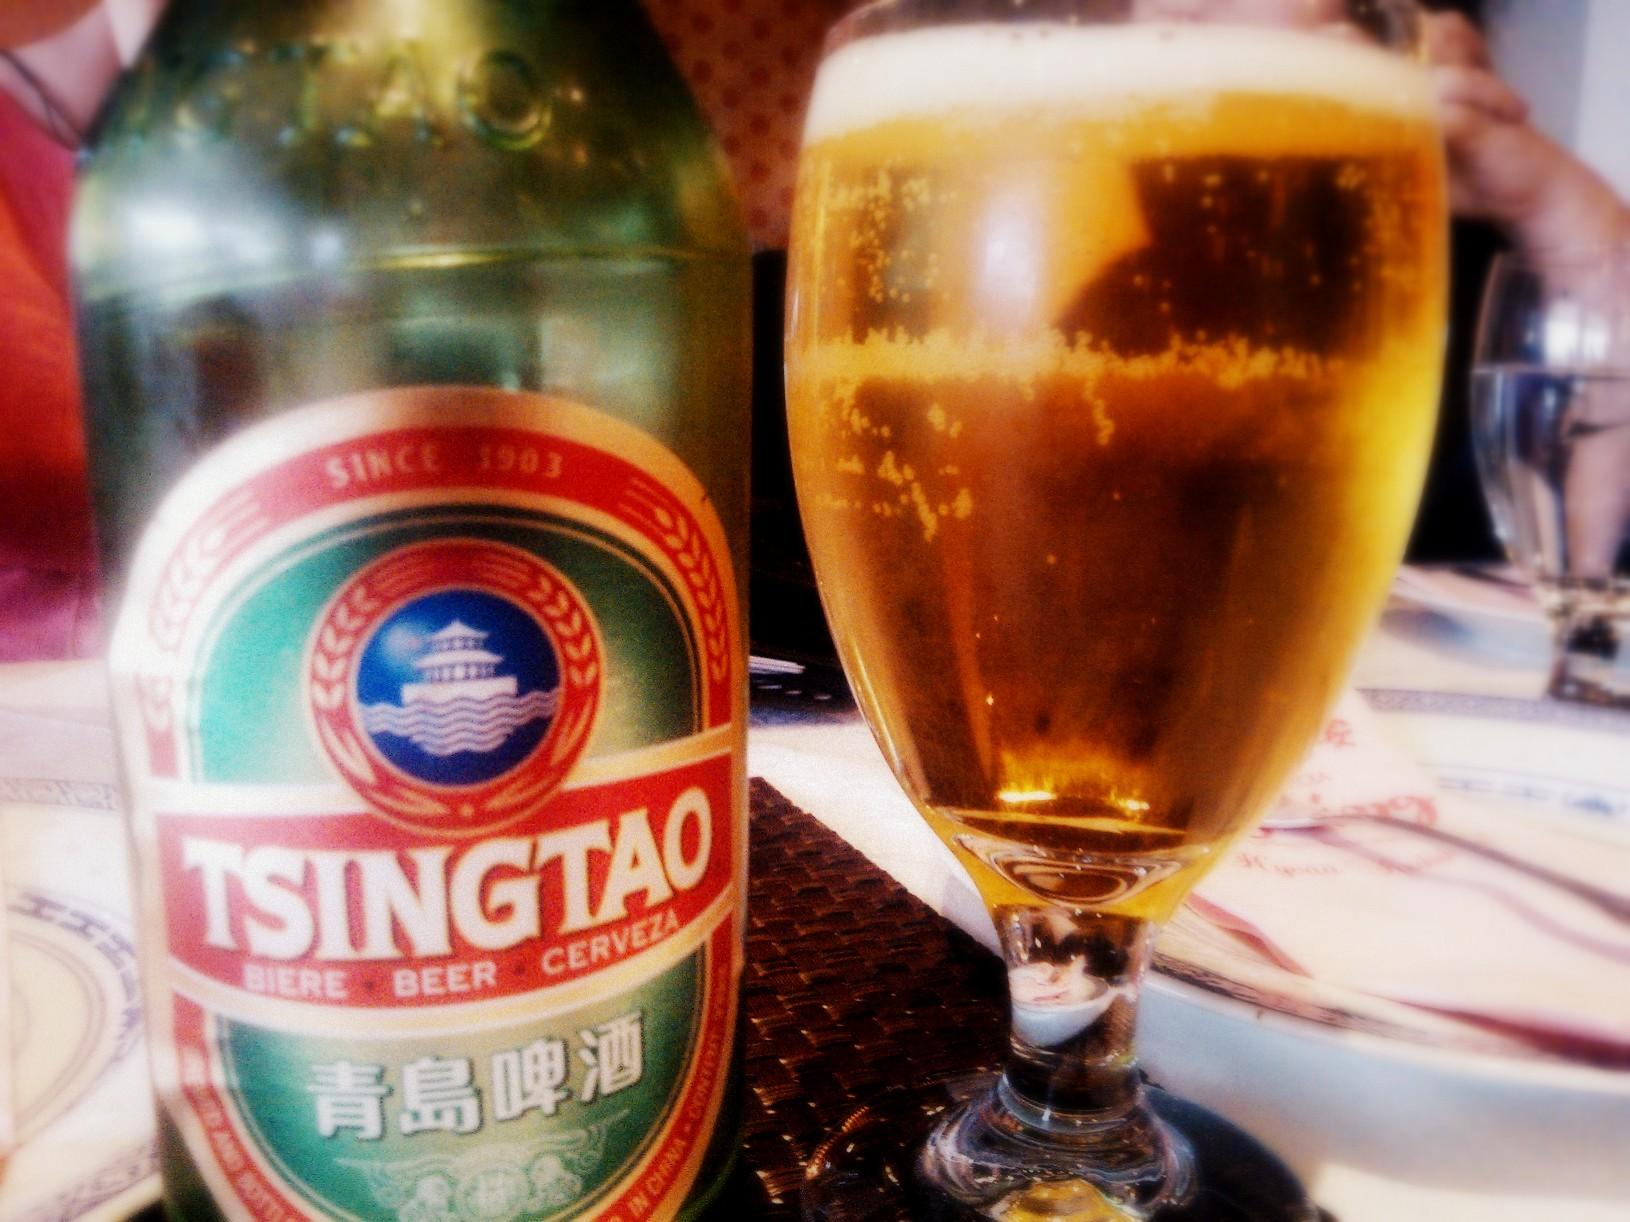 Tung Hing, Espoo: Tsingtao-olut 5€